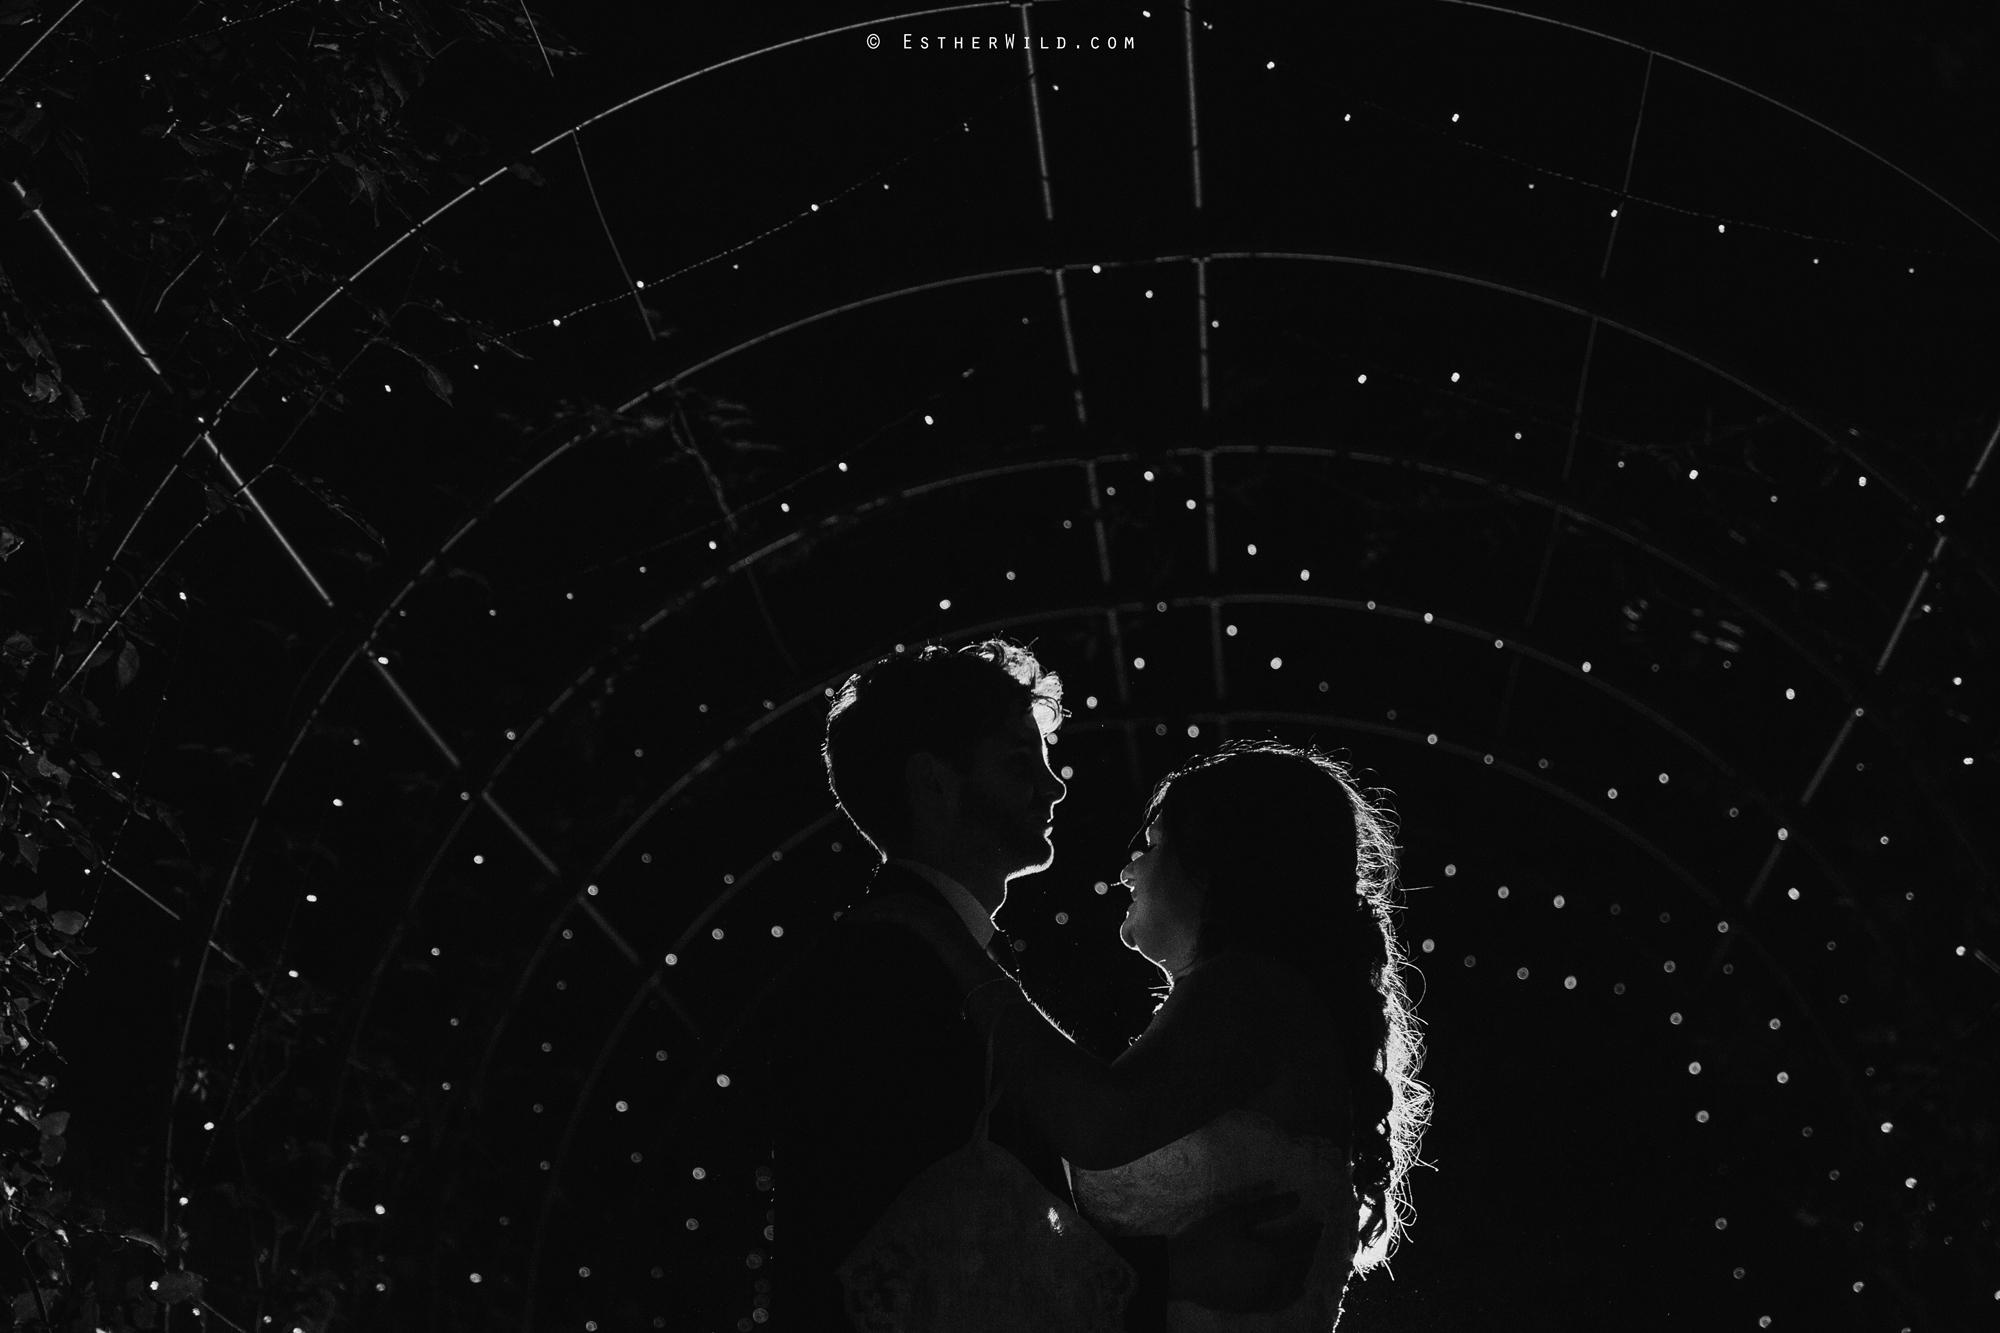 1017_Reading_Room_Weddings_Alby_Norwich_Photographer_Esther_Wild_IMG_2924-1.jpg